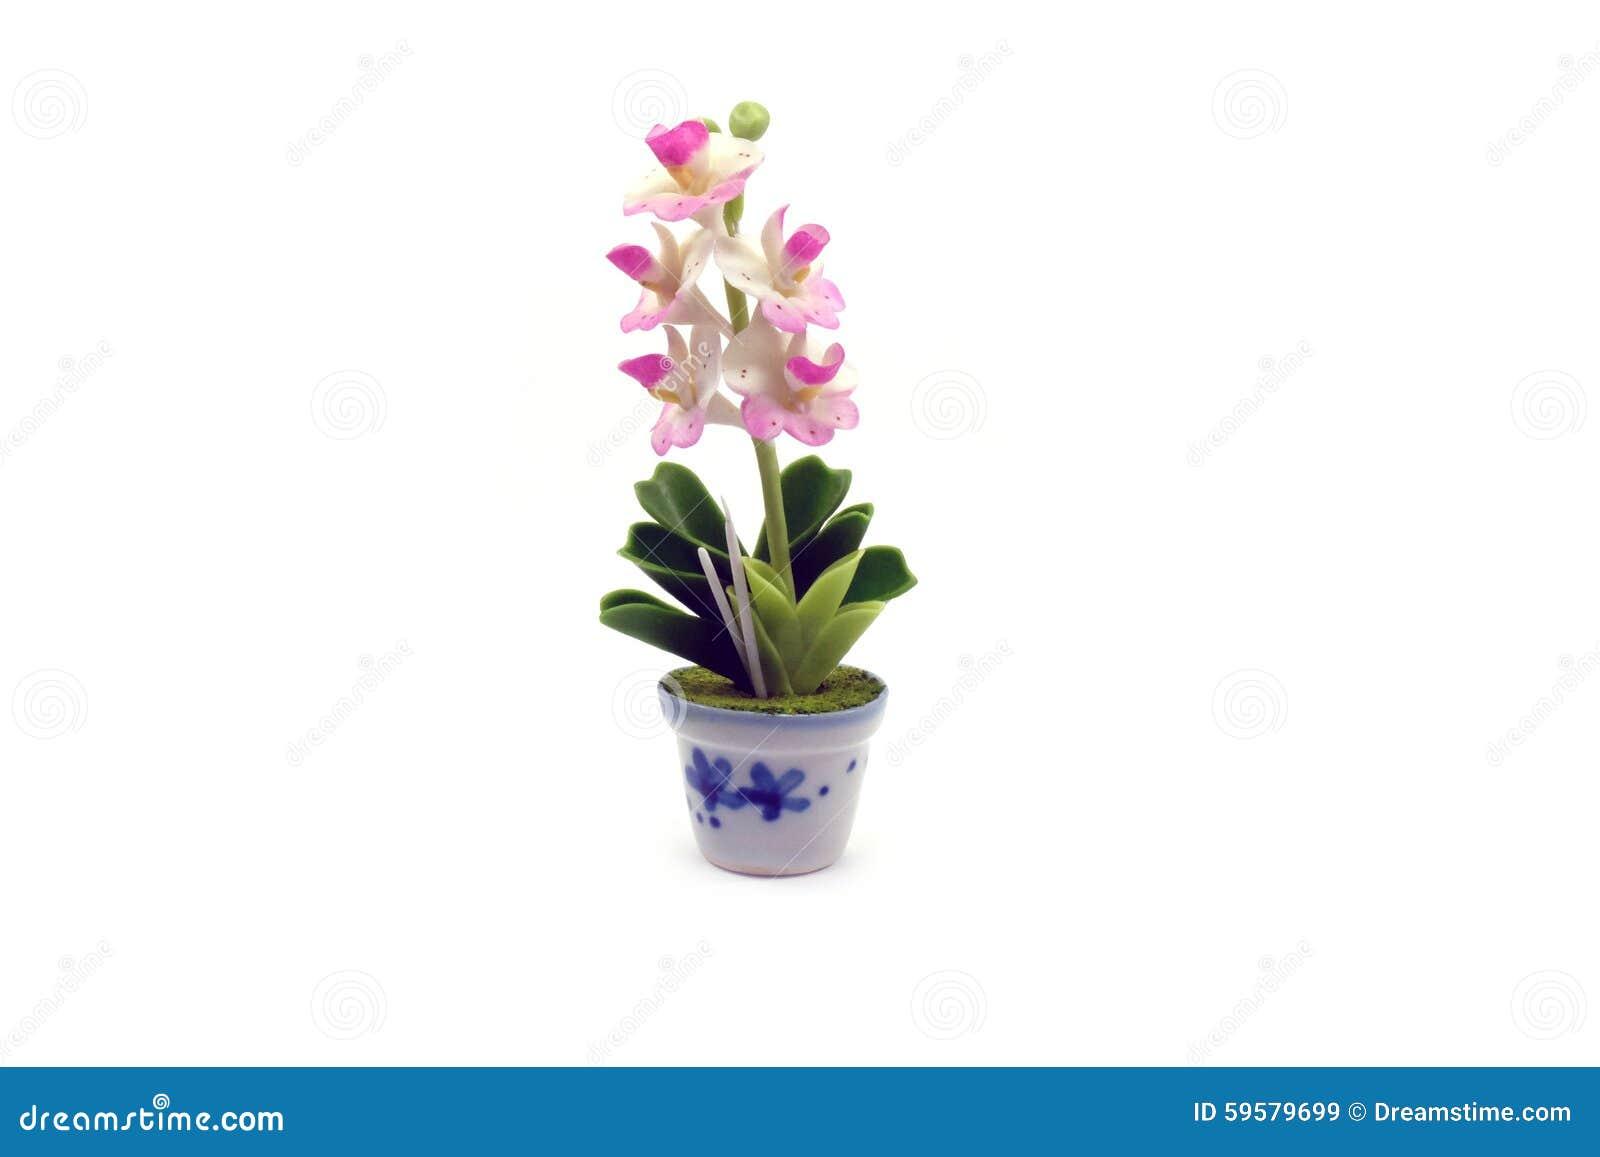 how to make mini clay flowers